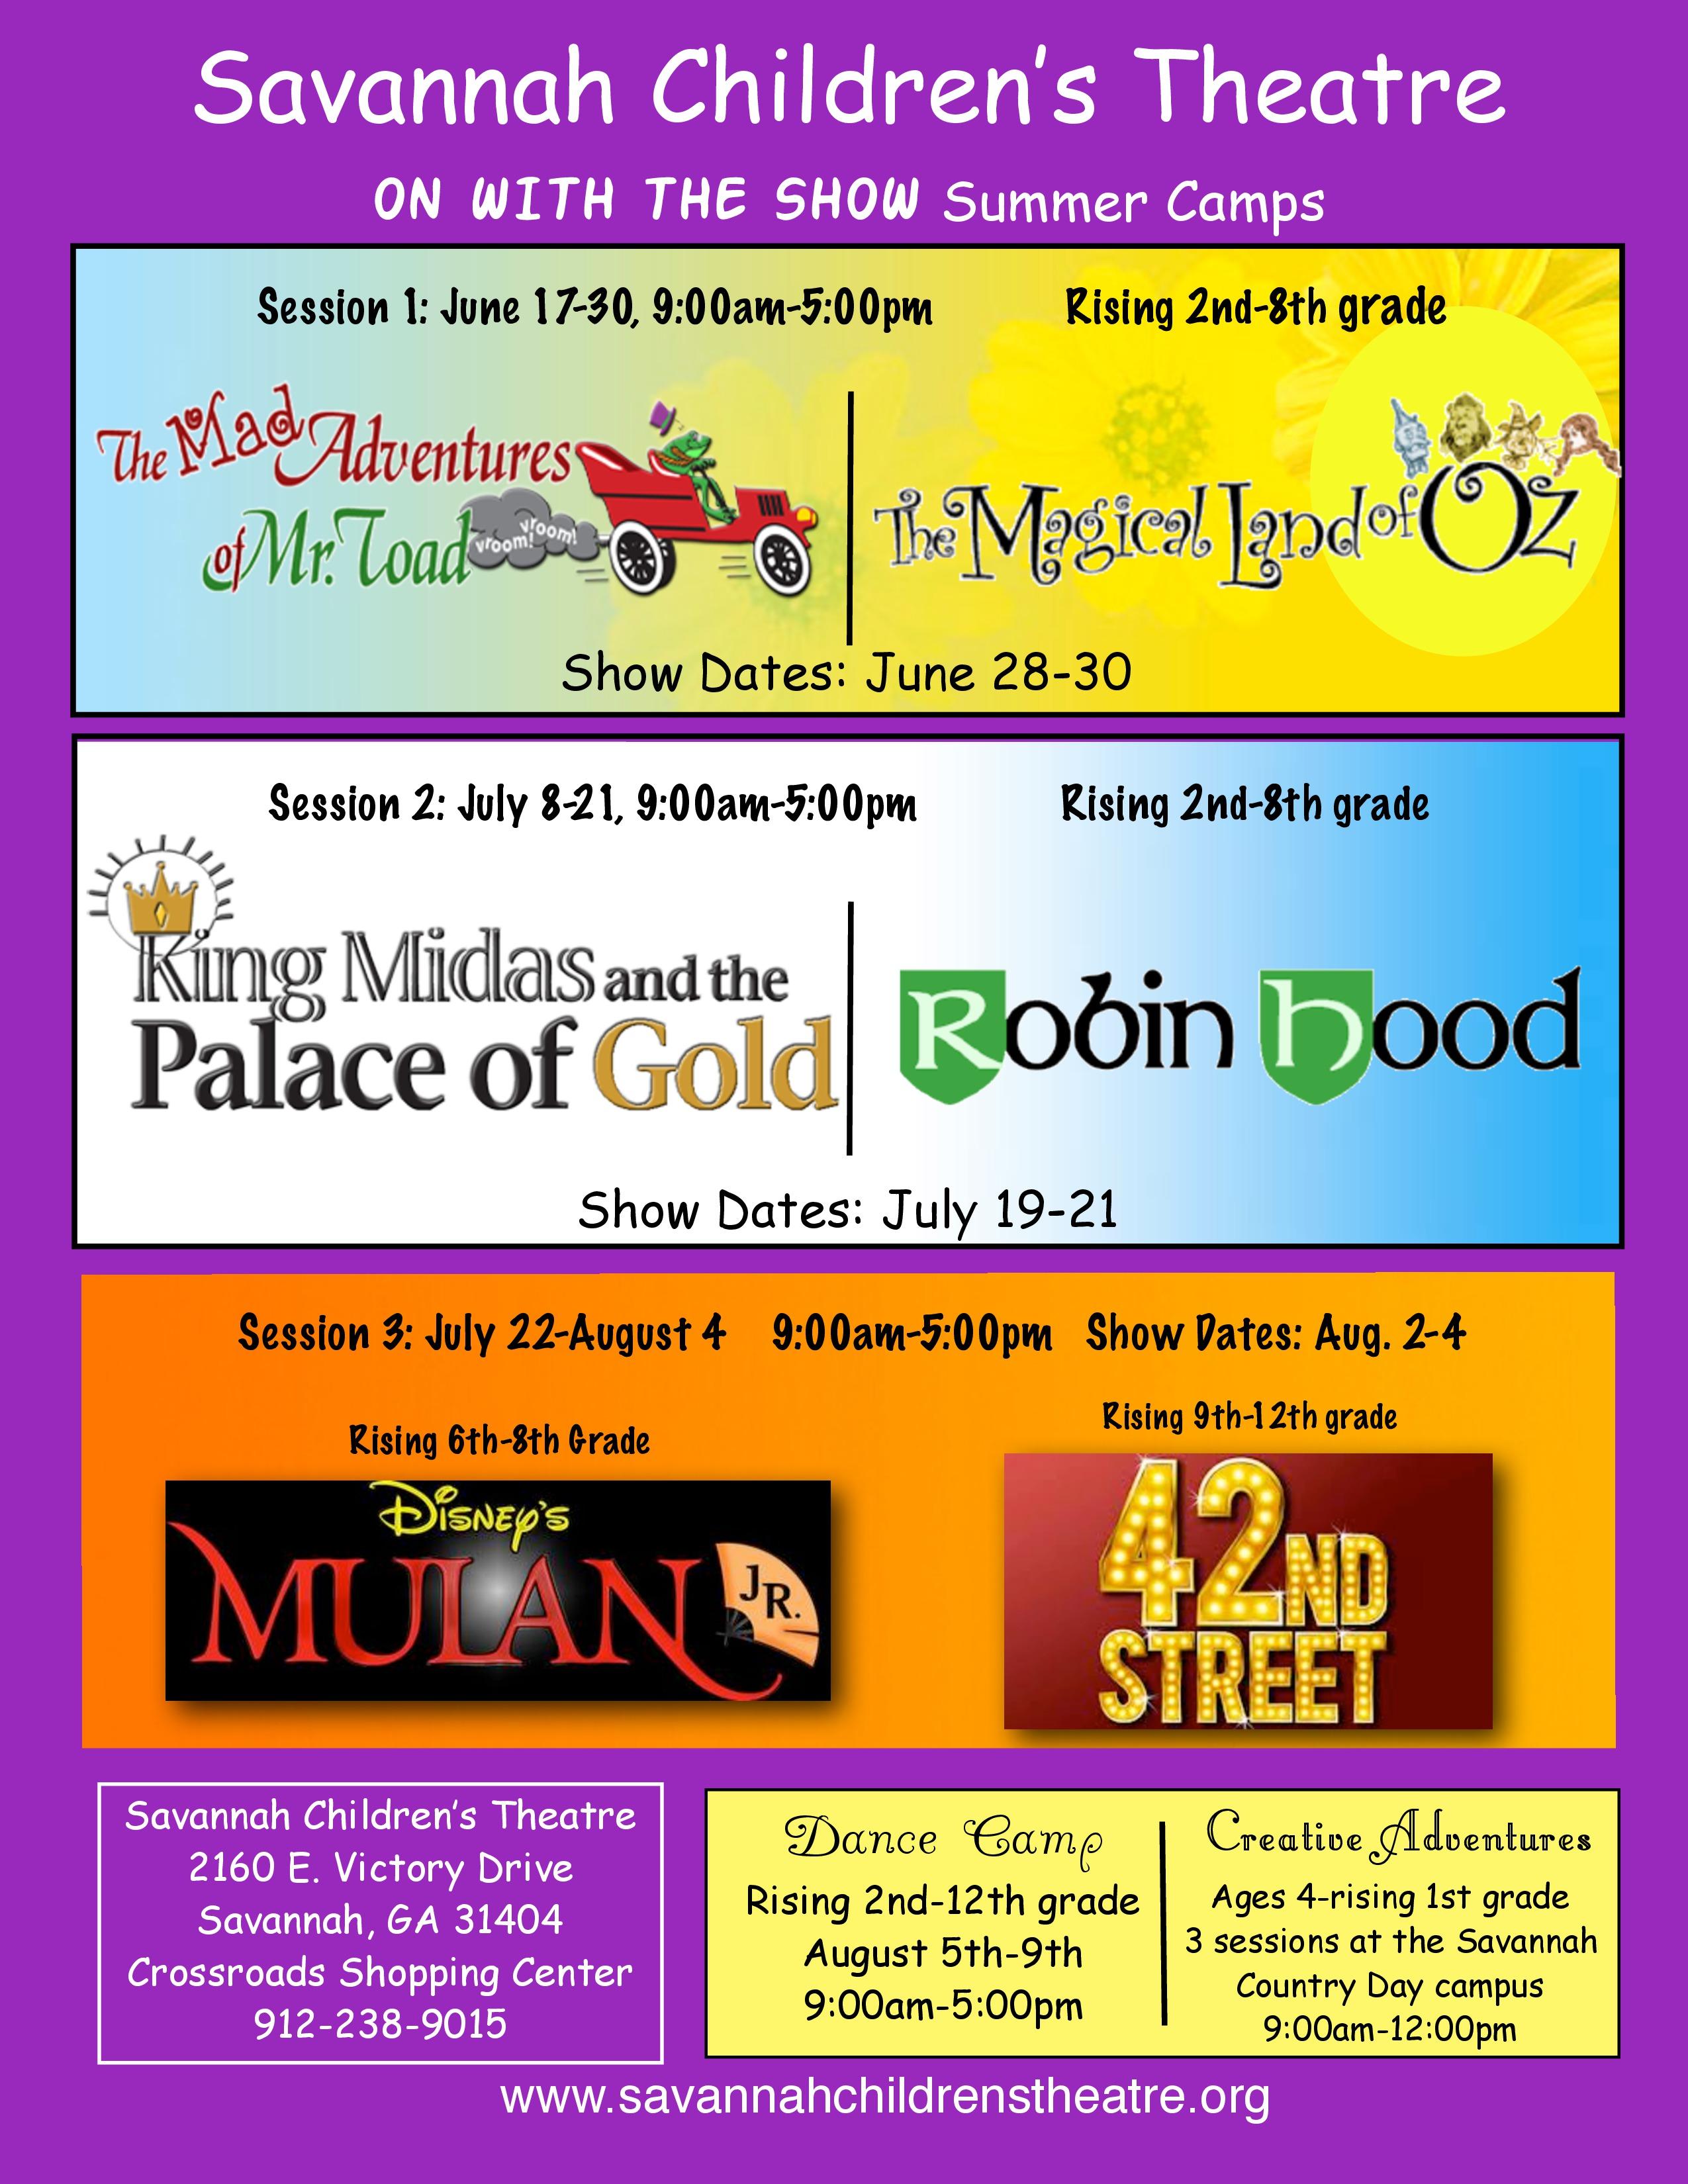 Savannah Summer Camps: Drama Camps at Savannah Children's Theatre